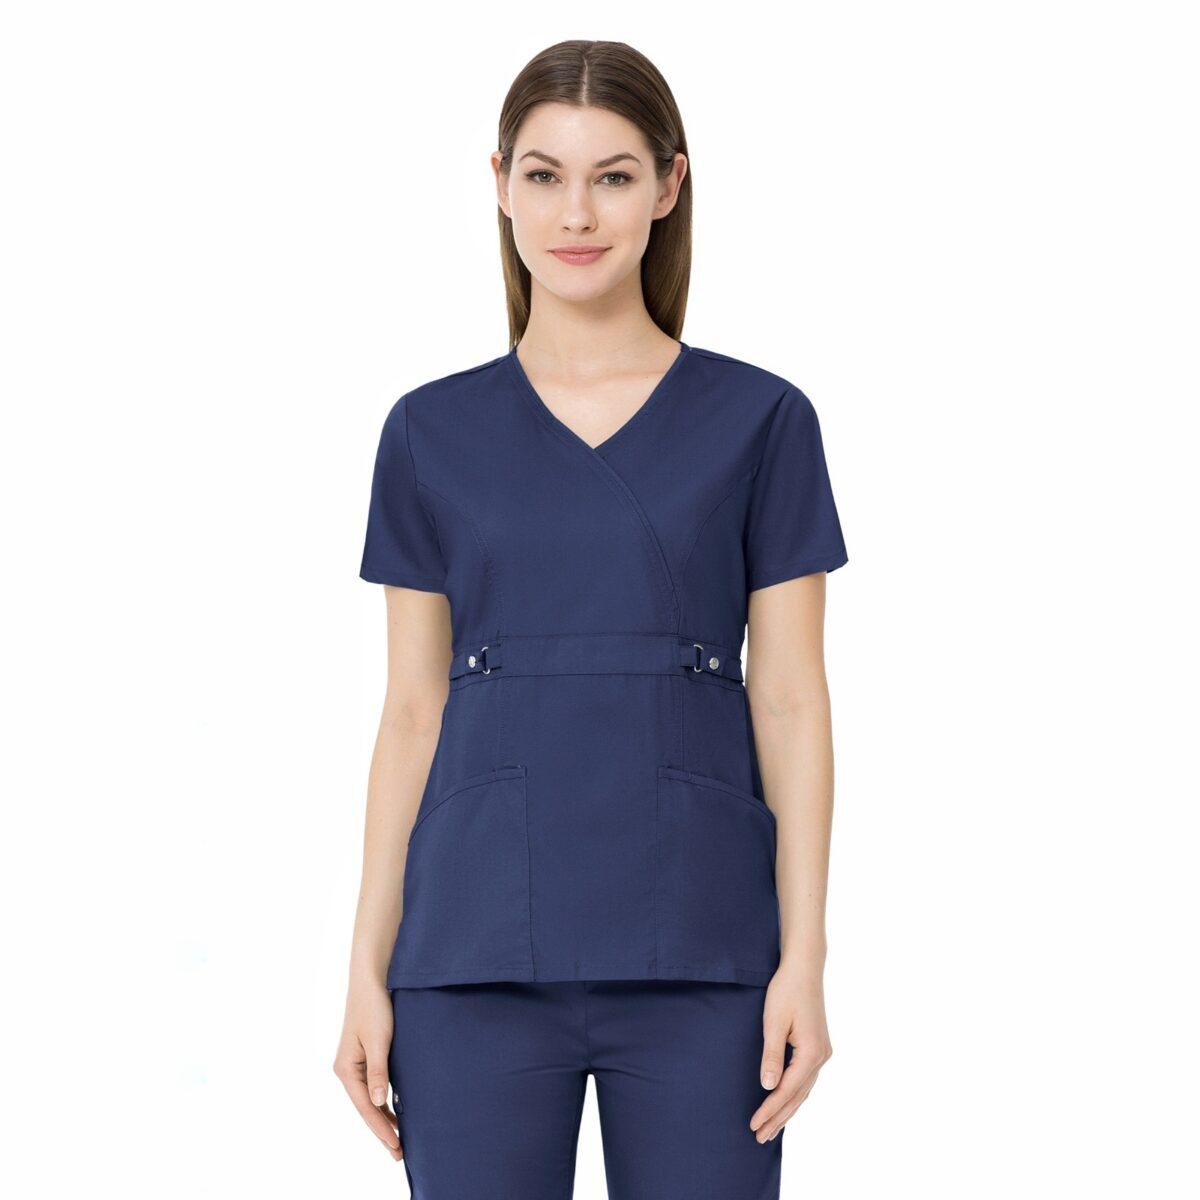 ♥ Женский медицинский костюм Luxe цвет - темно-синий